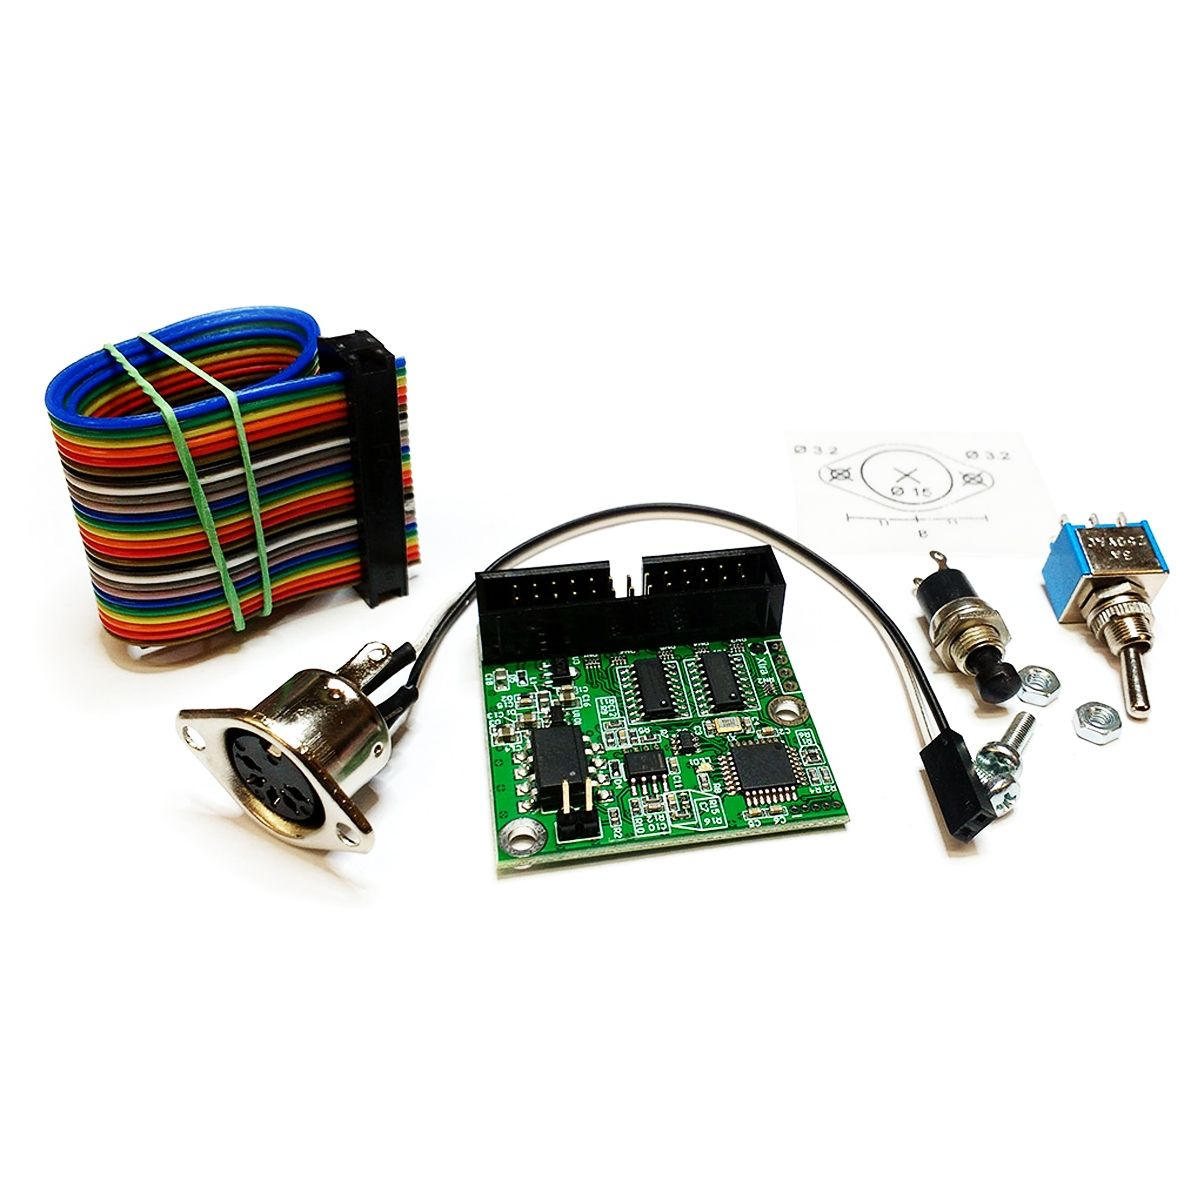 Tubbutec UniPulse MIDI Upgrade Kit (CR-78) MK3